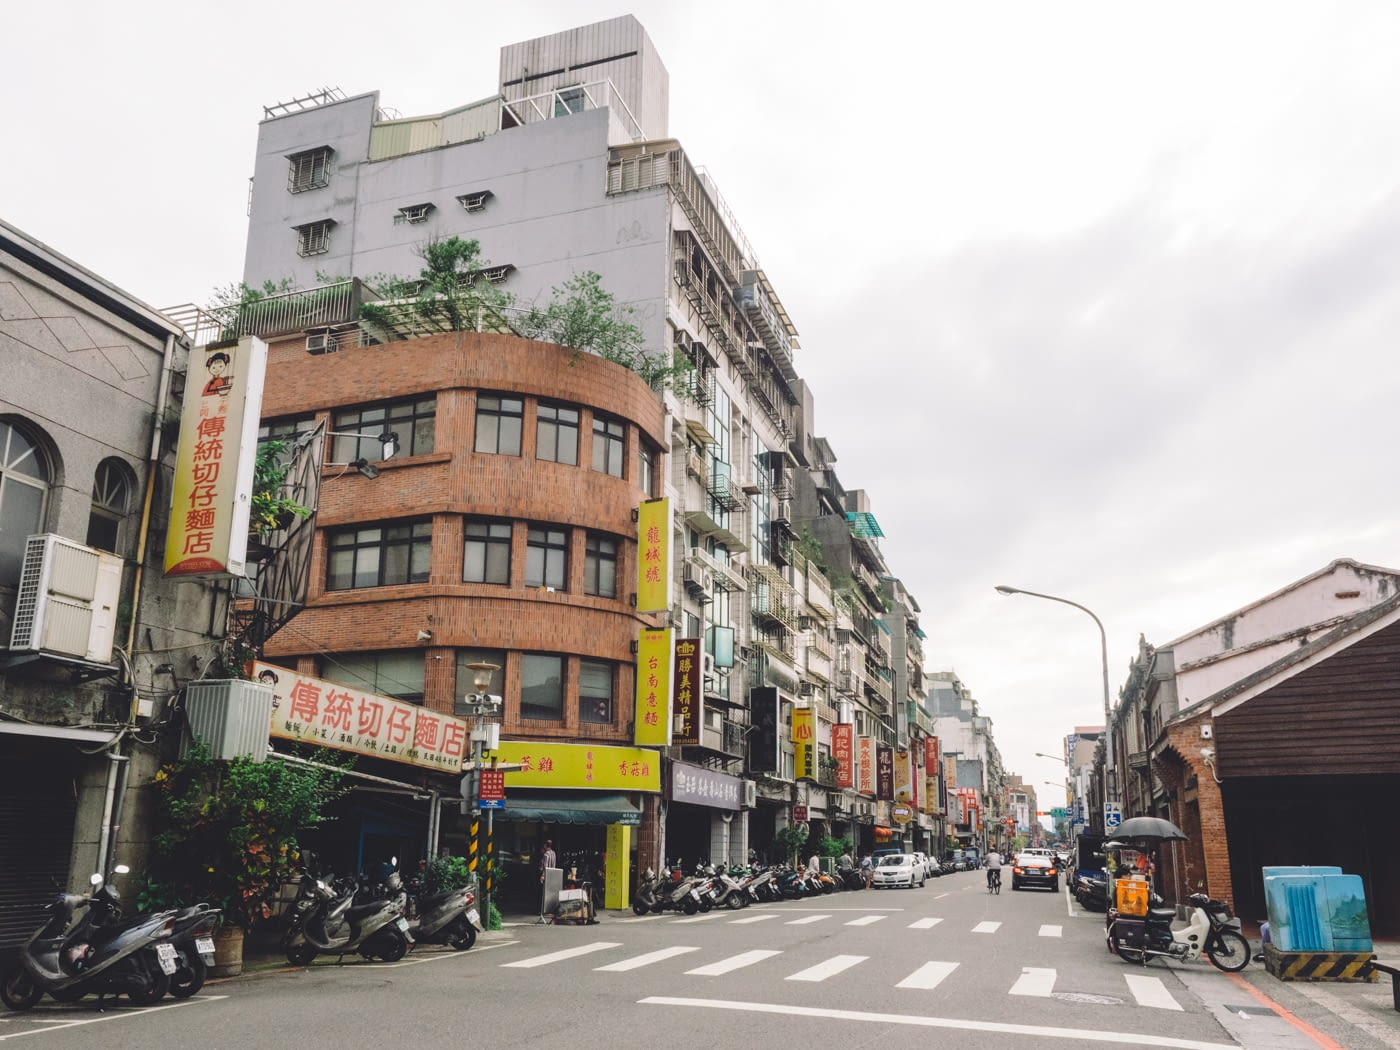 Taiwan - Taipei - Random street shot